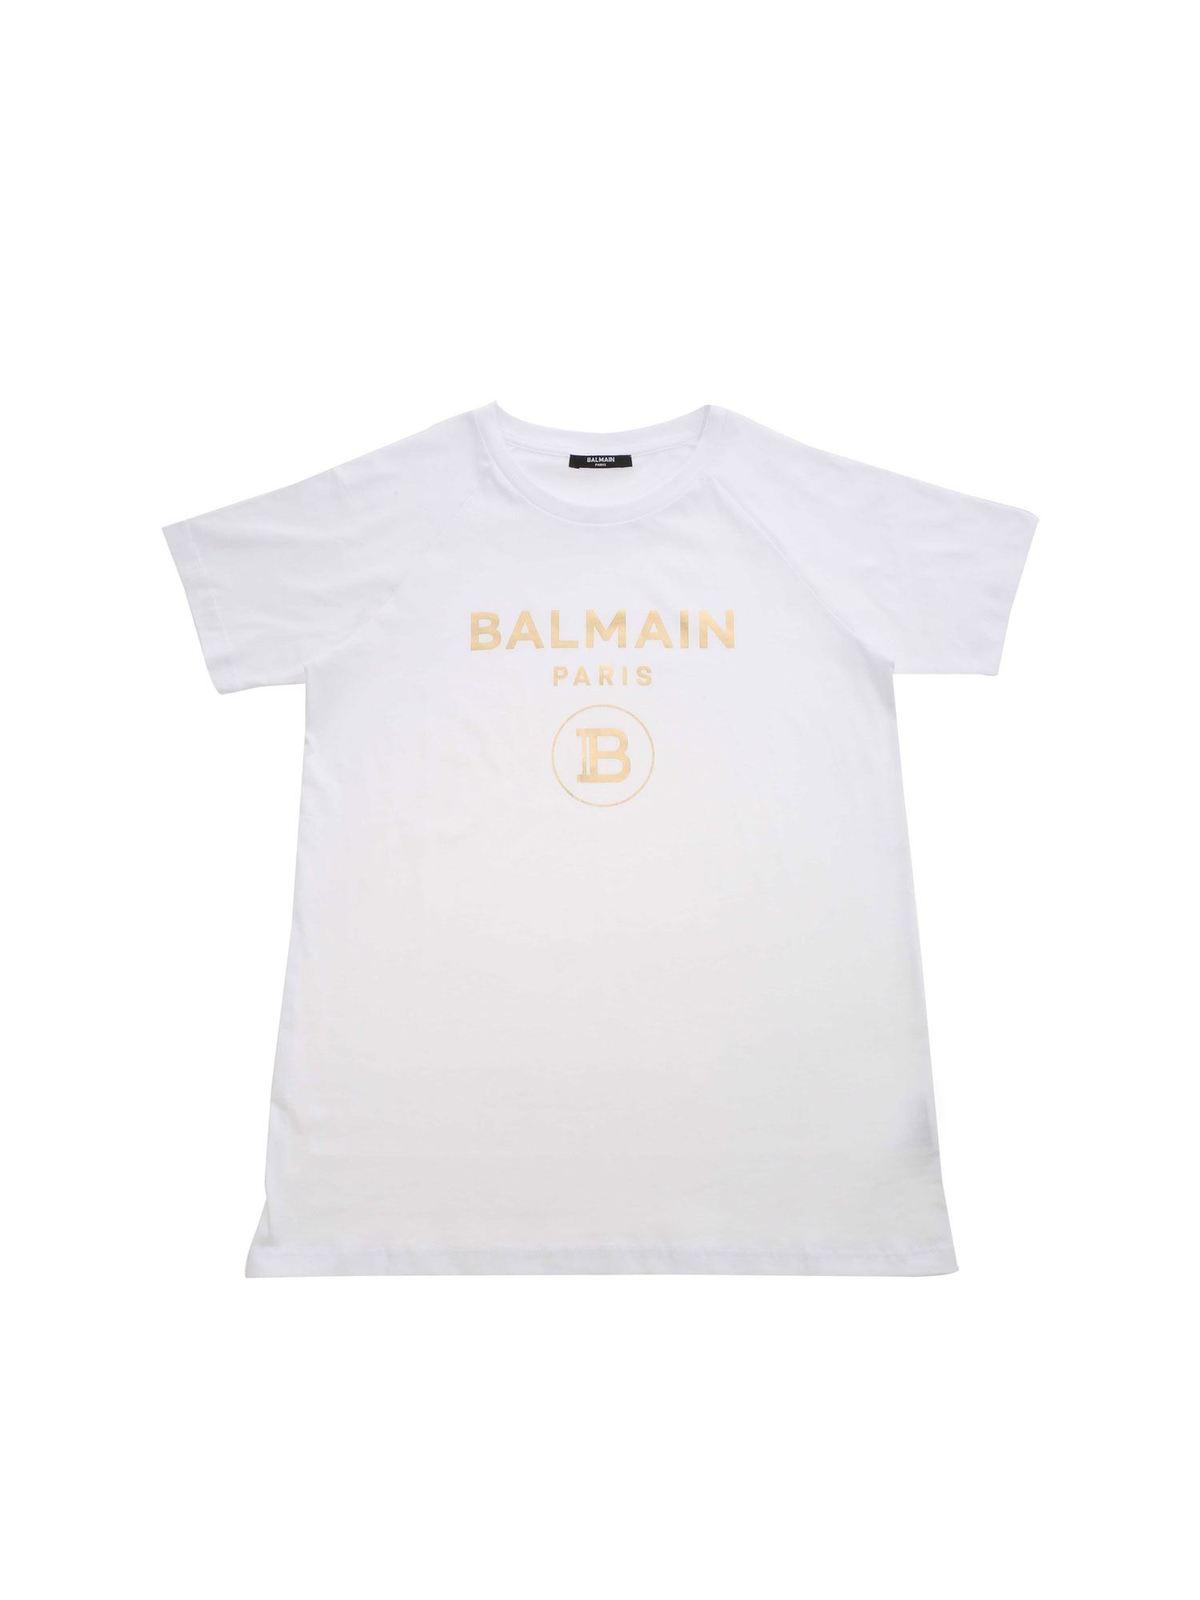 Balmain Cottons LOGO PRINT T-SHIRT IN WHITE